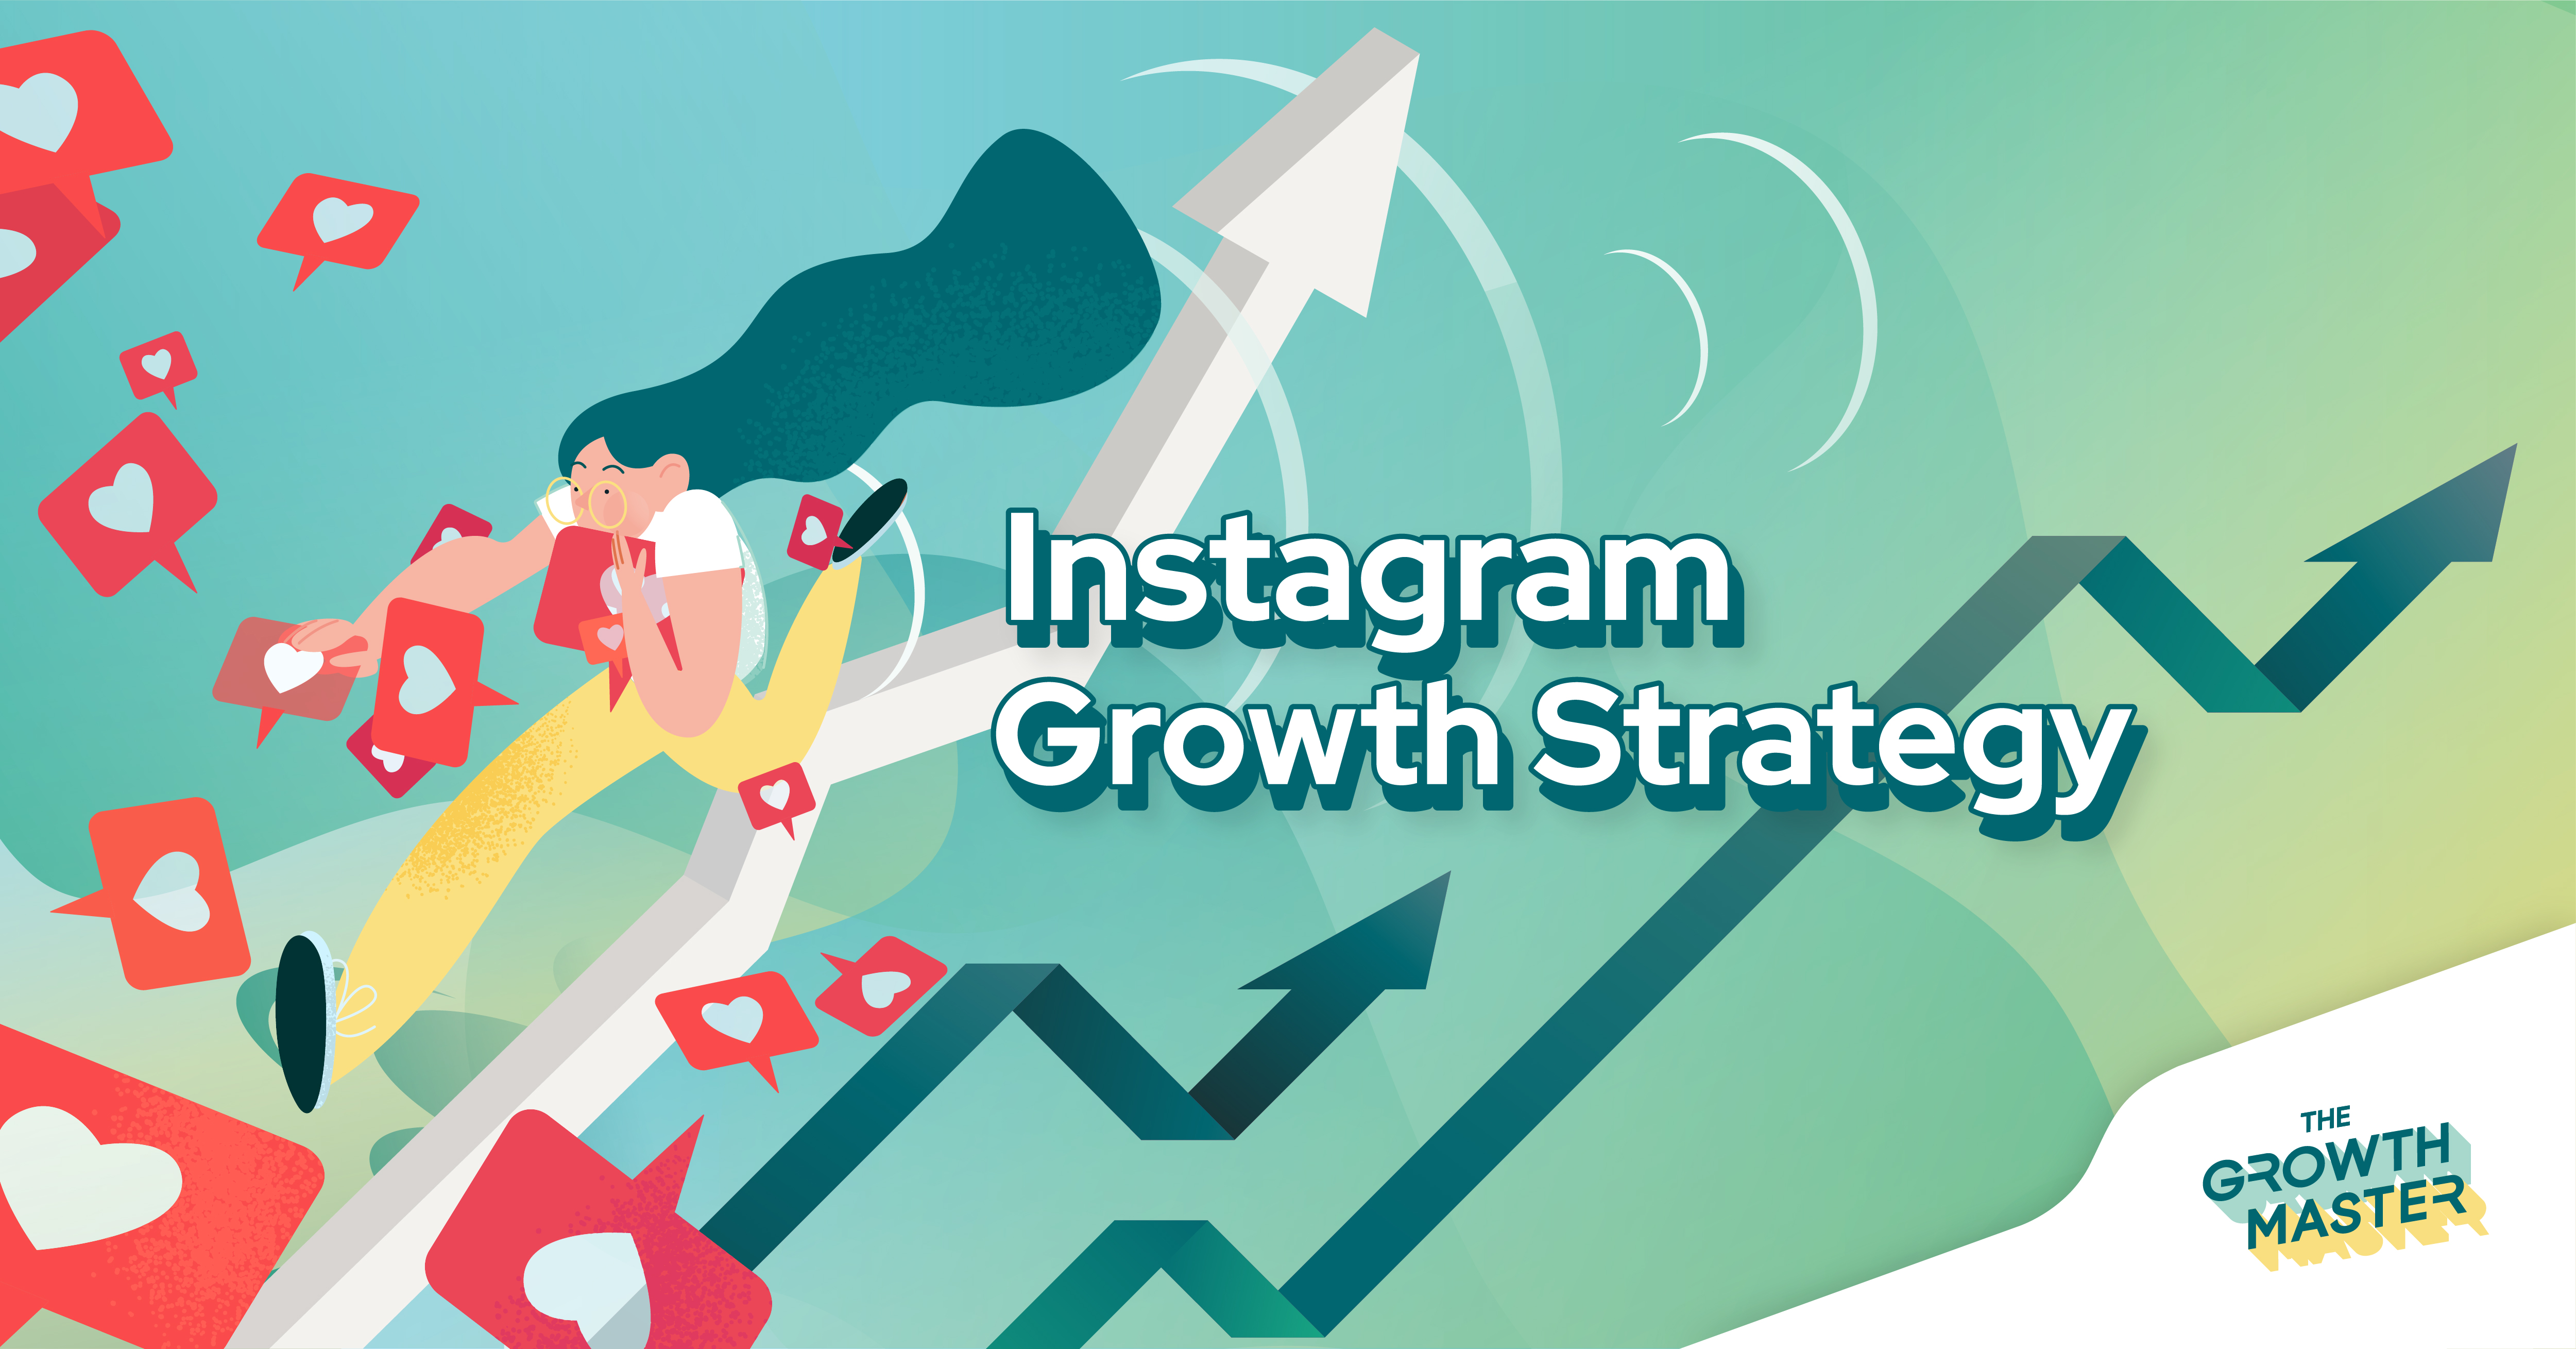 Instagram Growth Strategy : ตัวอย่างกลยุทธ์การเพิ่มยอด Followers บน Instagram